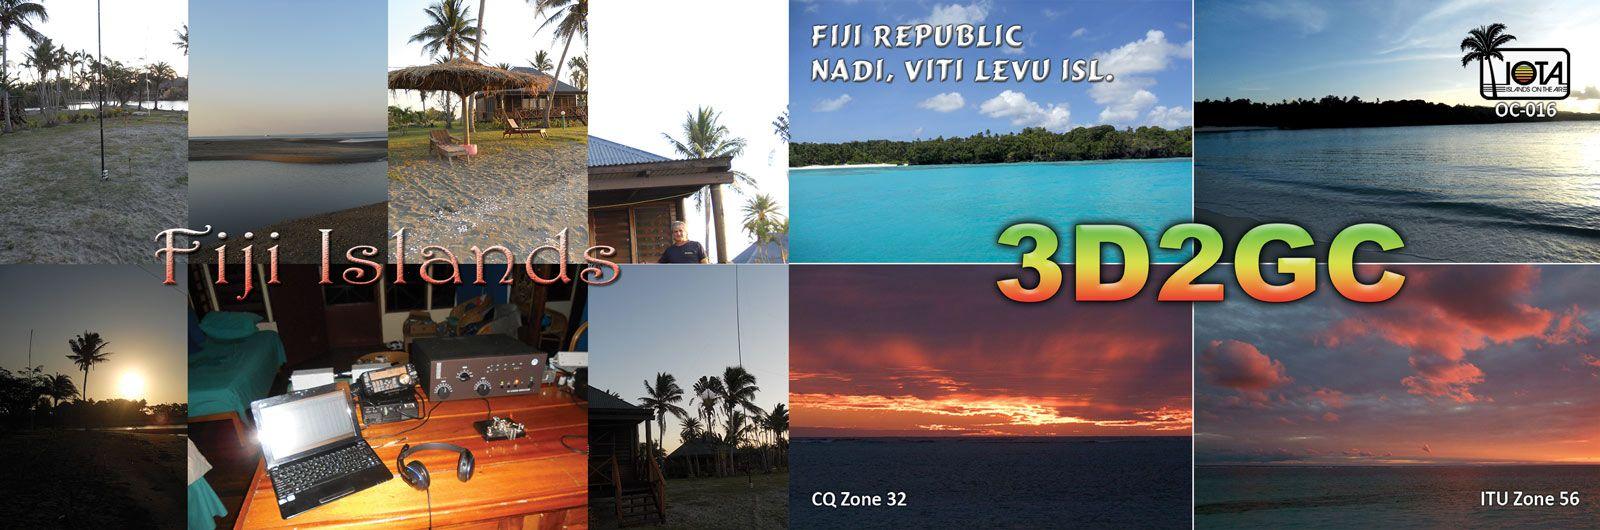 Viti Levu Island 3D2GC Fiji Islands QSL